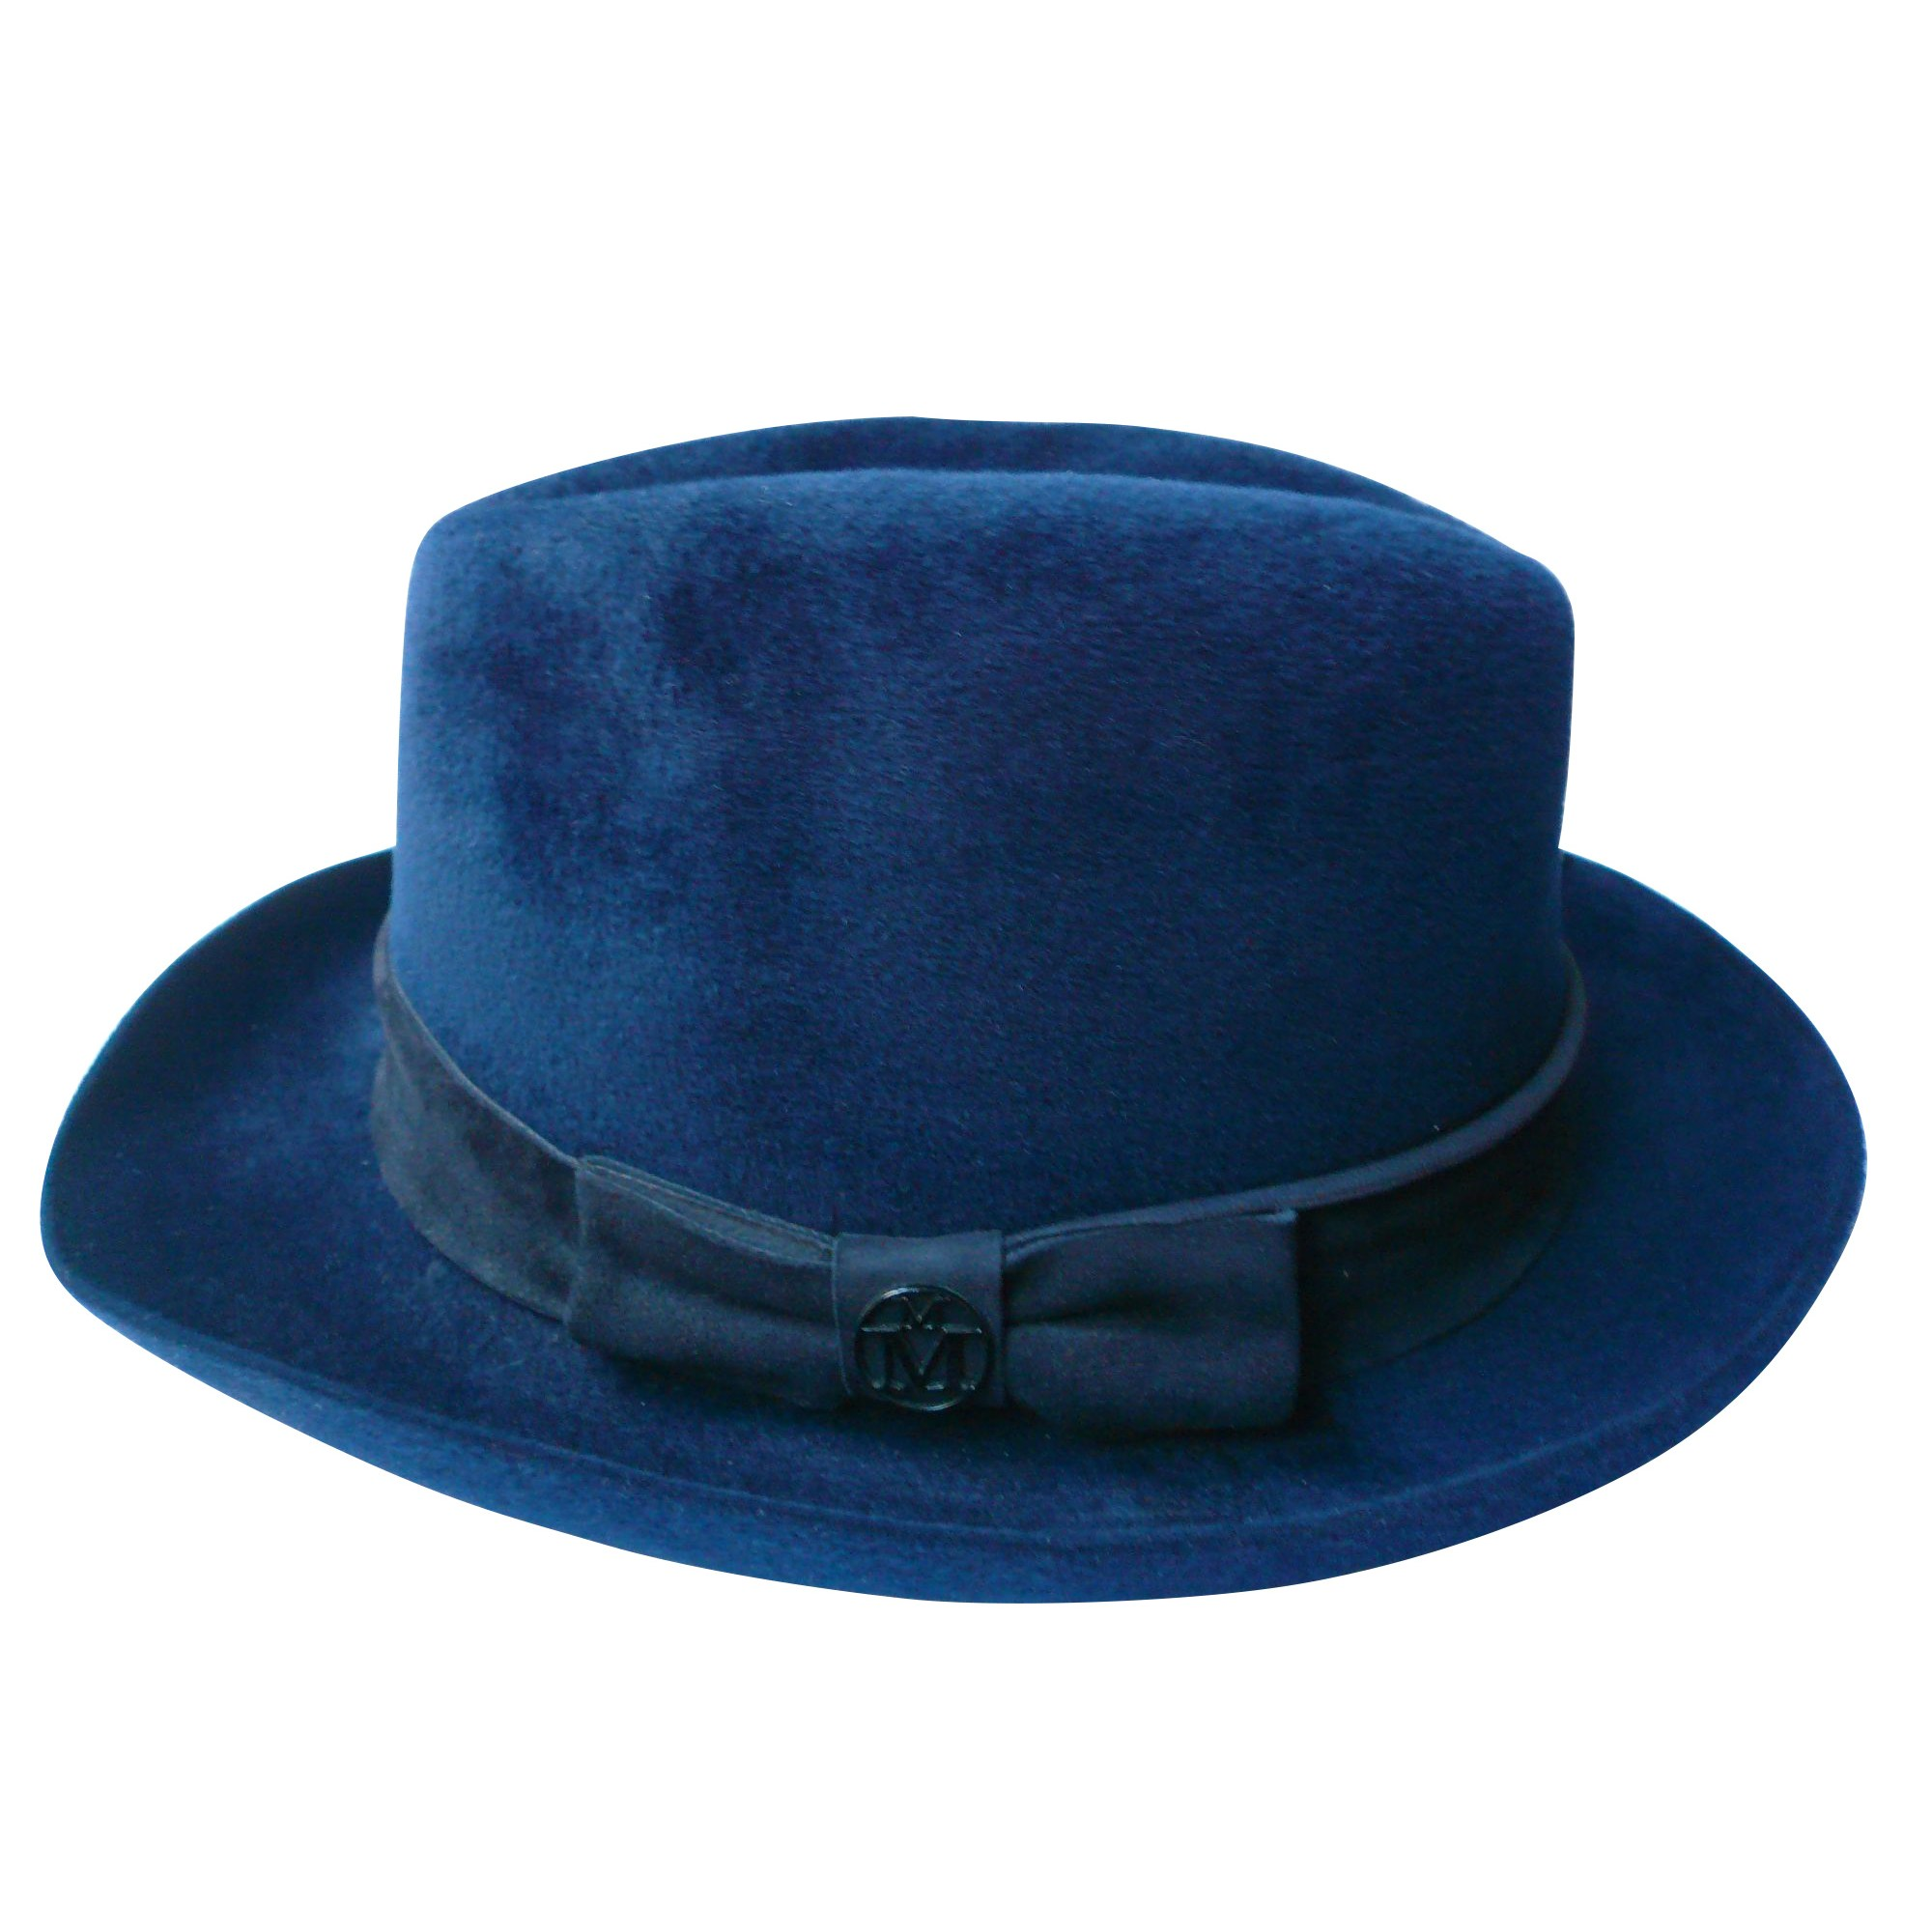 Chapeau MAISON MICHEL Bleu, bleu marine, bleu turquoise